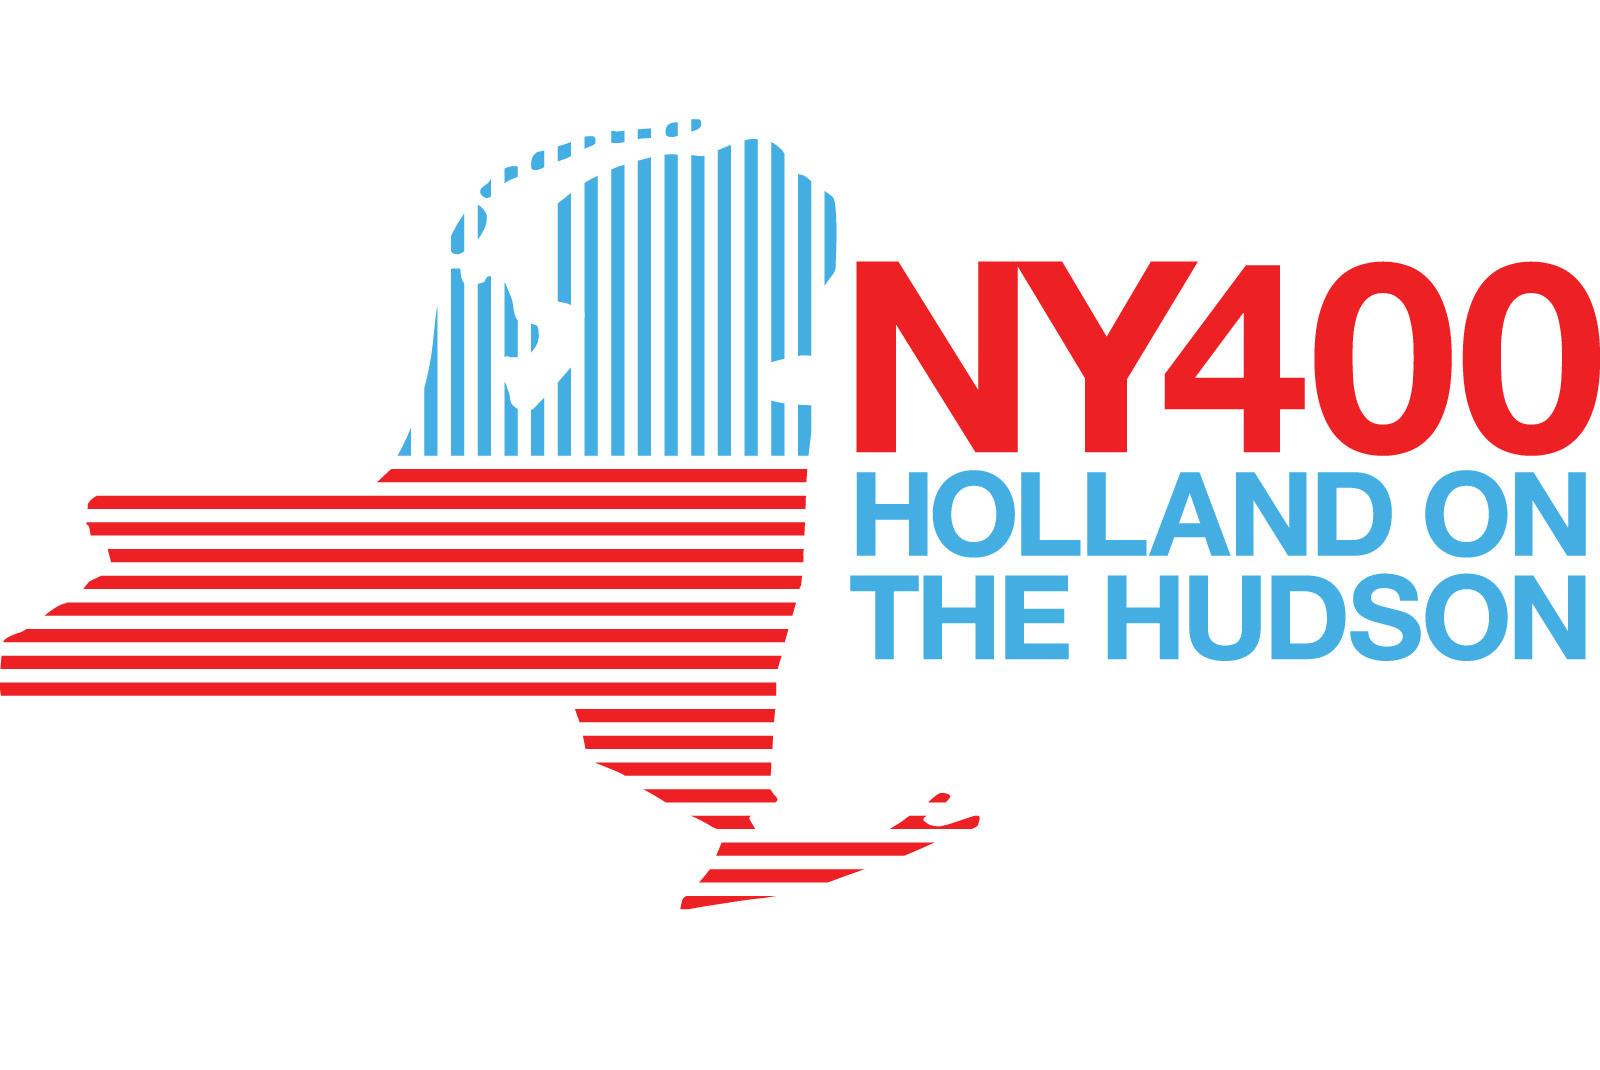 Holland on the Hudson